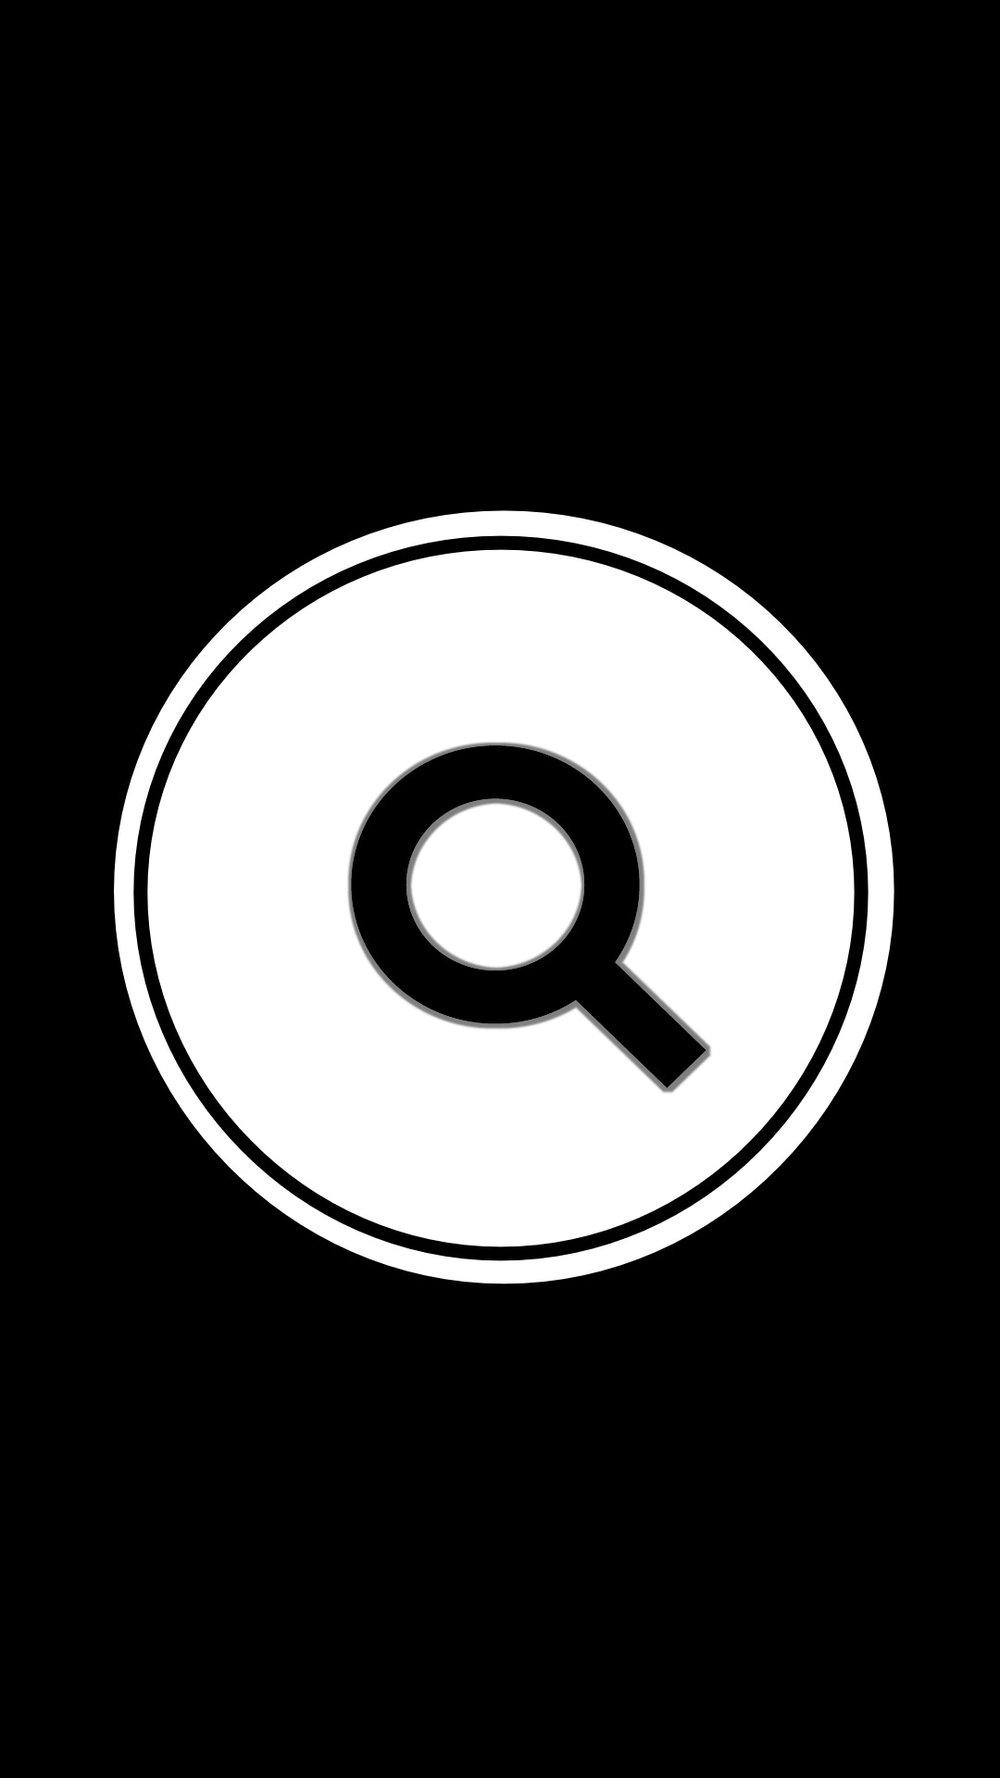 Instagram-cover-searching-black.jpg